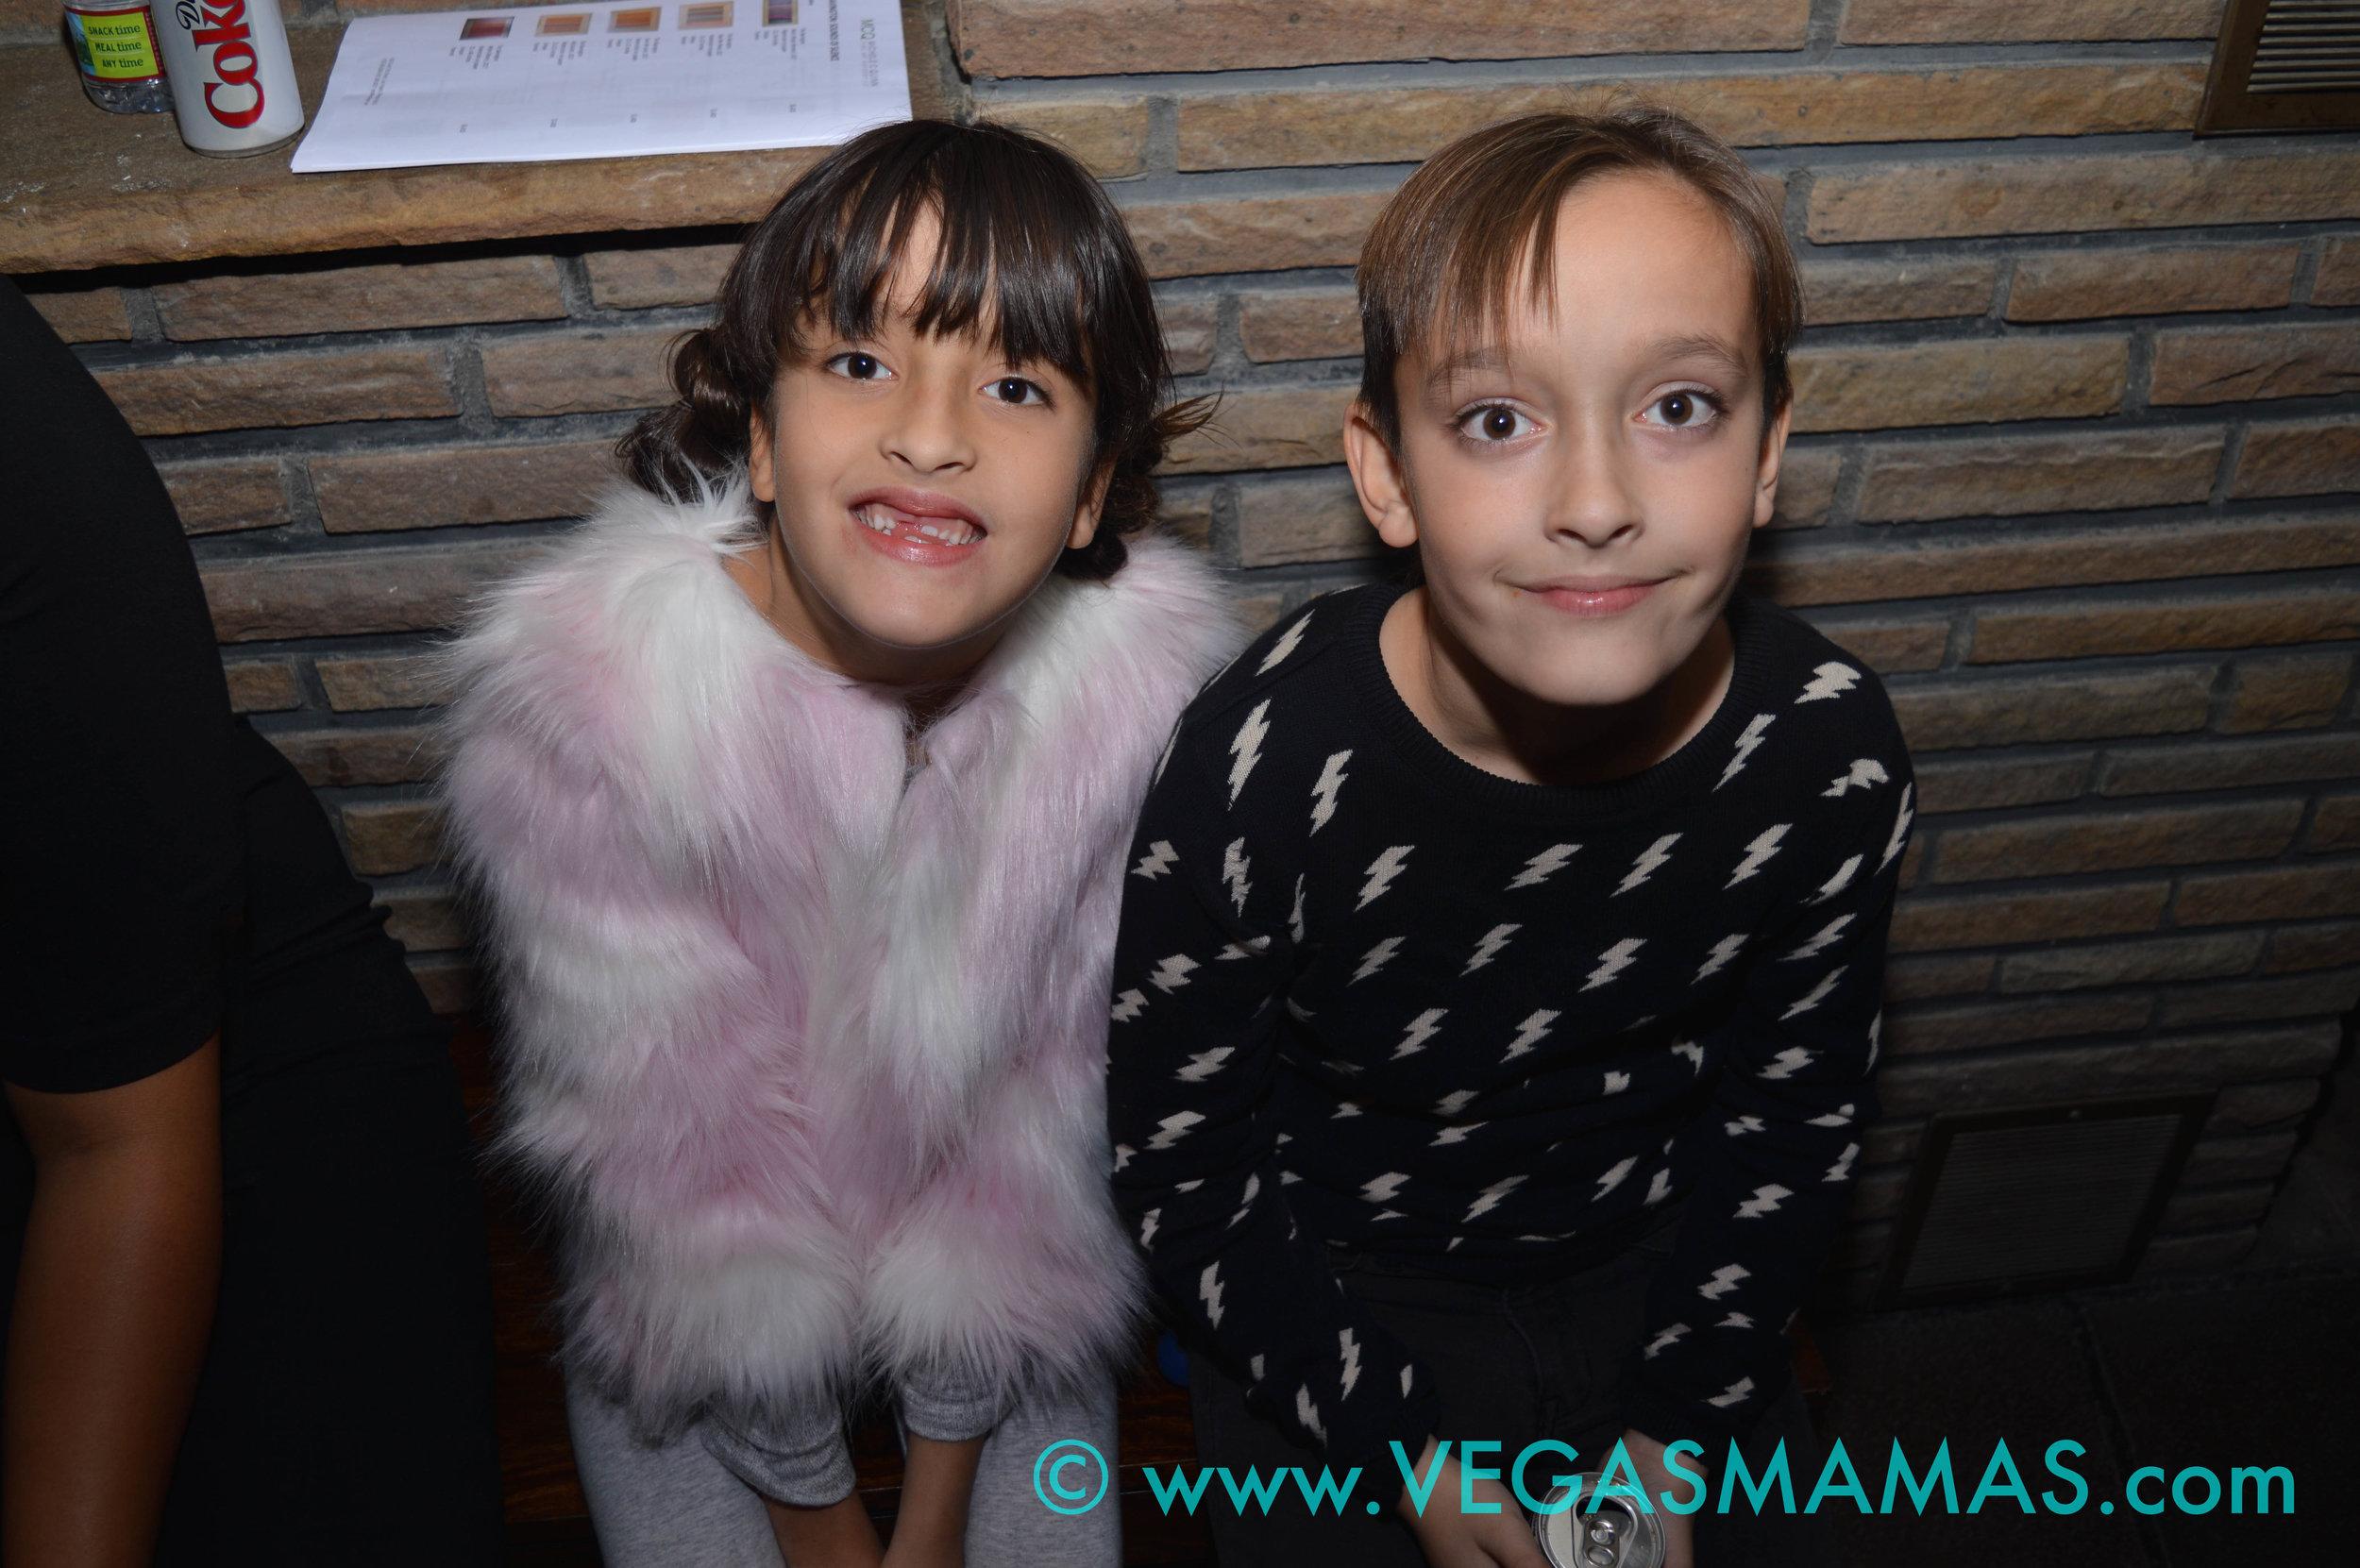 Lily Bavington with her twin brother, Jet Bavington